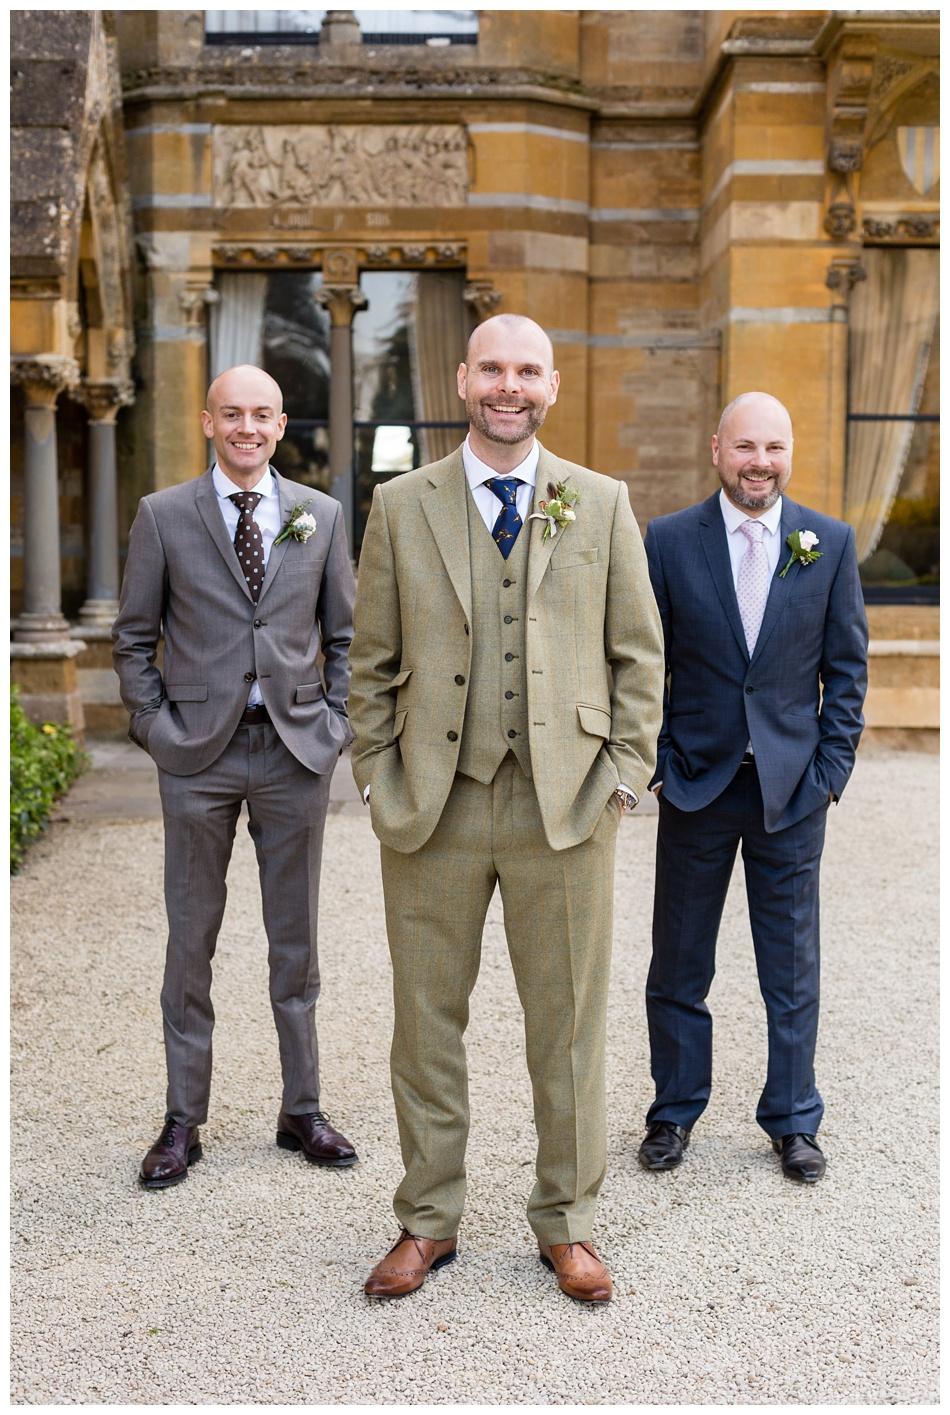 Groomsmen at Ettington Park Wedding